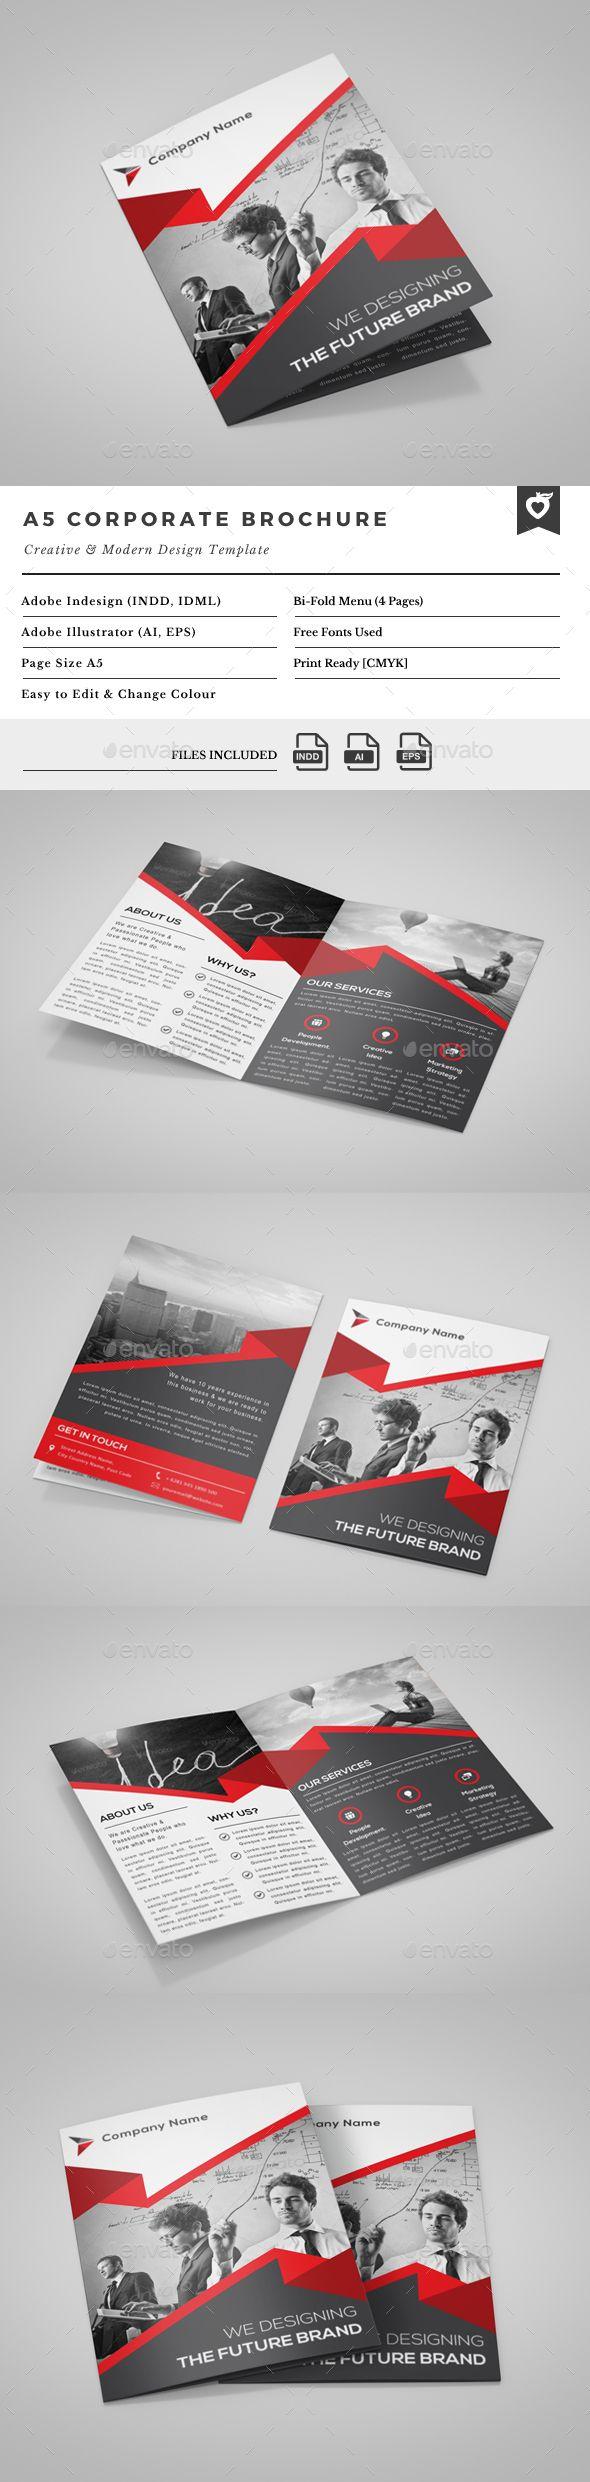 bi fold brochure template indesign - 3730 best images about dtp editorial design on pinterest